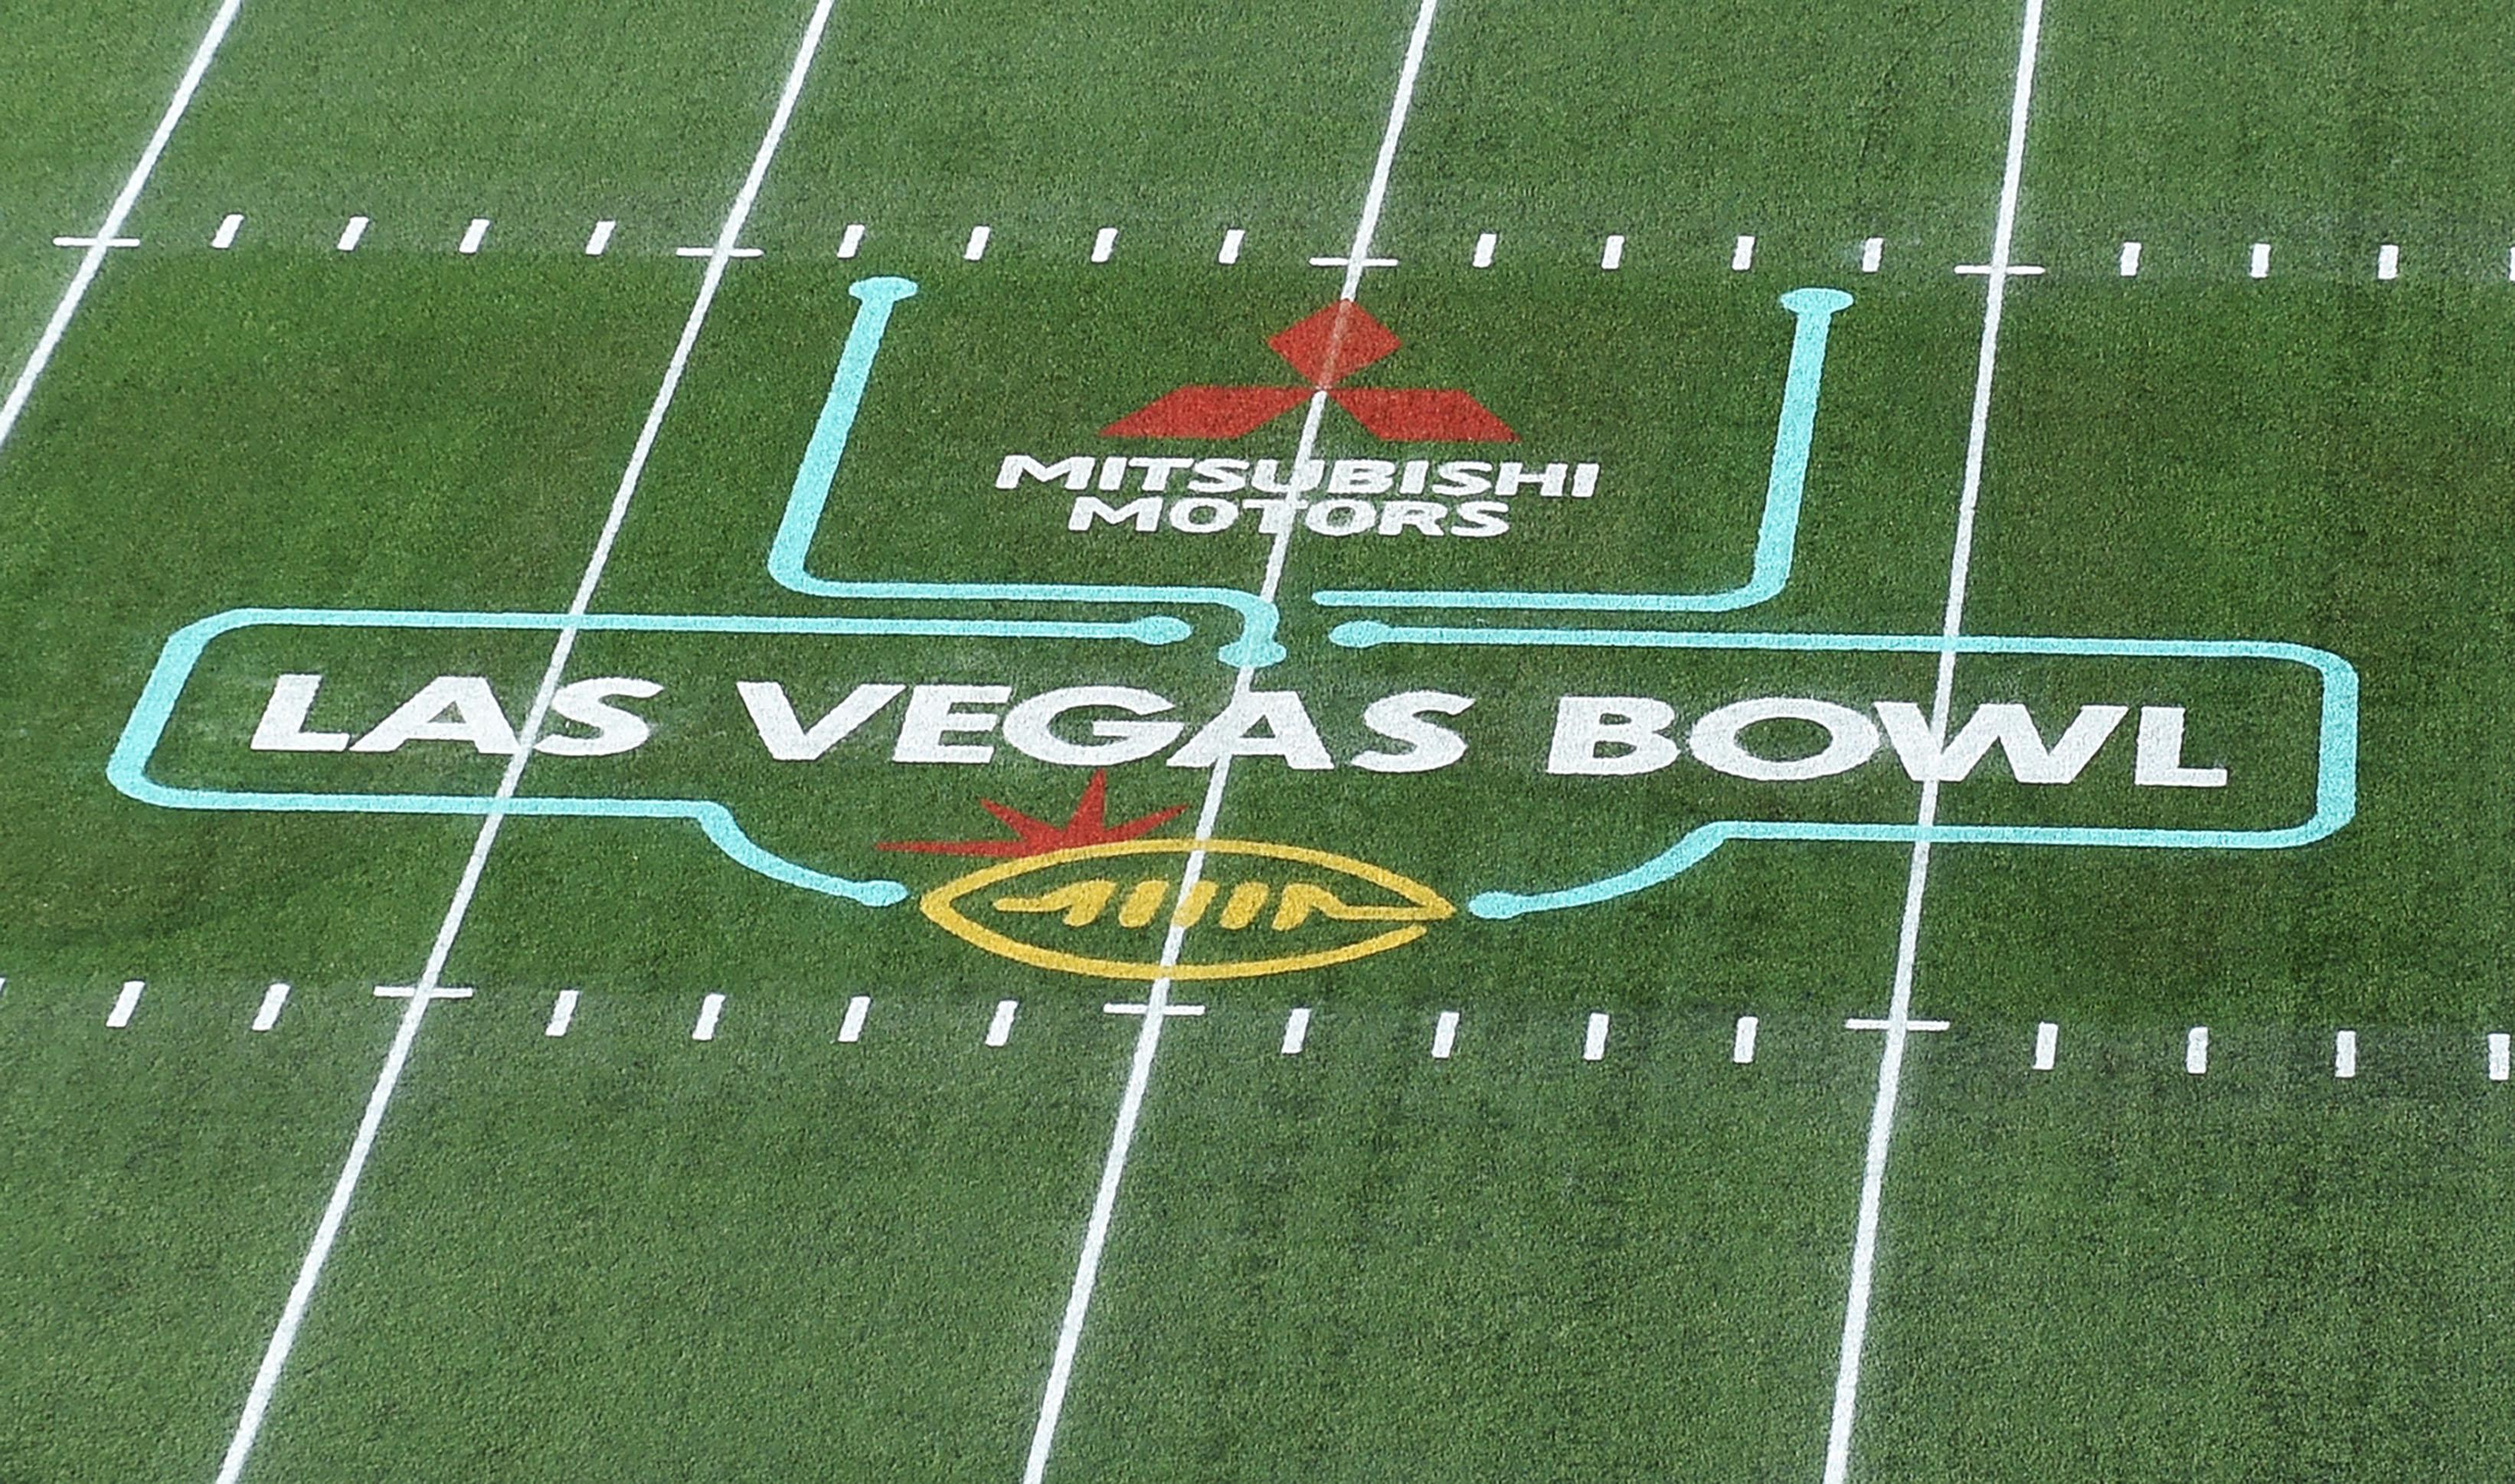 Mitsubishi Motors Las Vegas Bowl - Fresno State v Arizona State